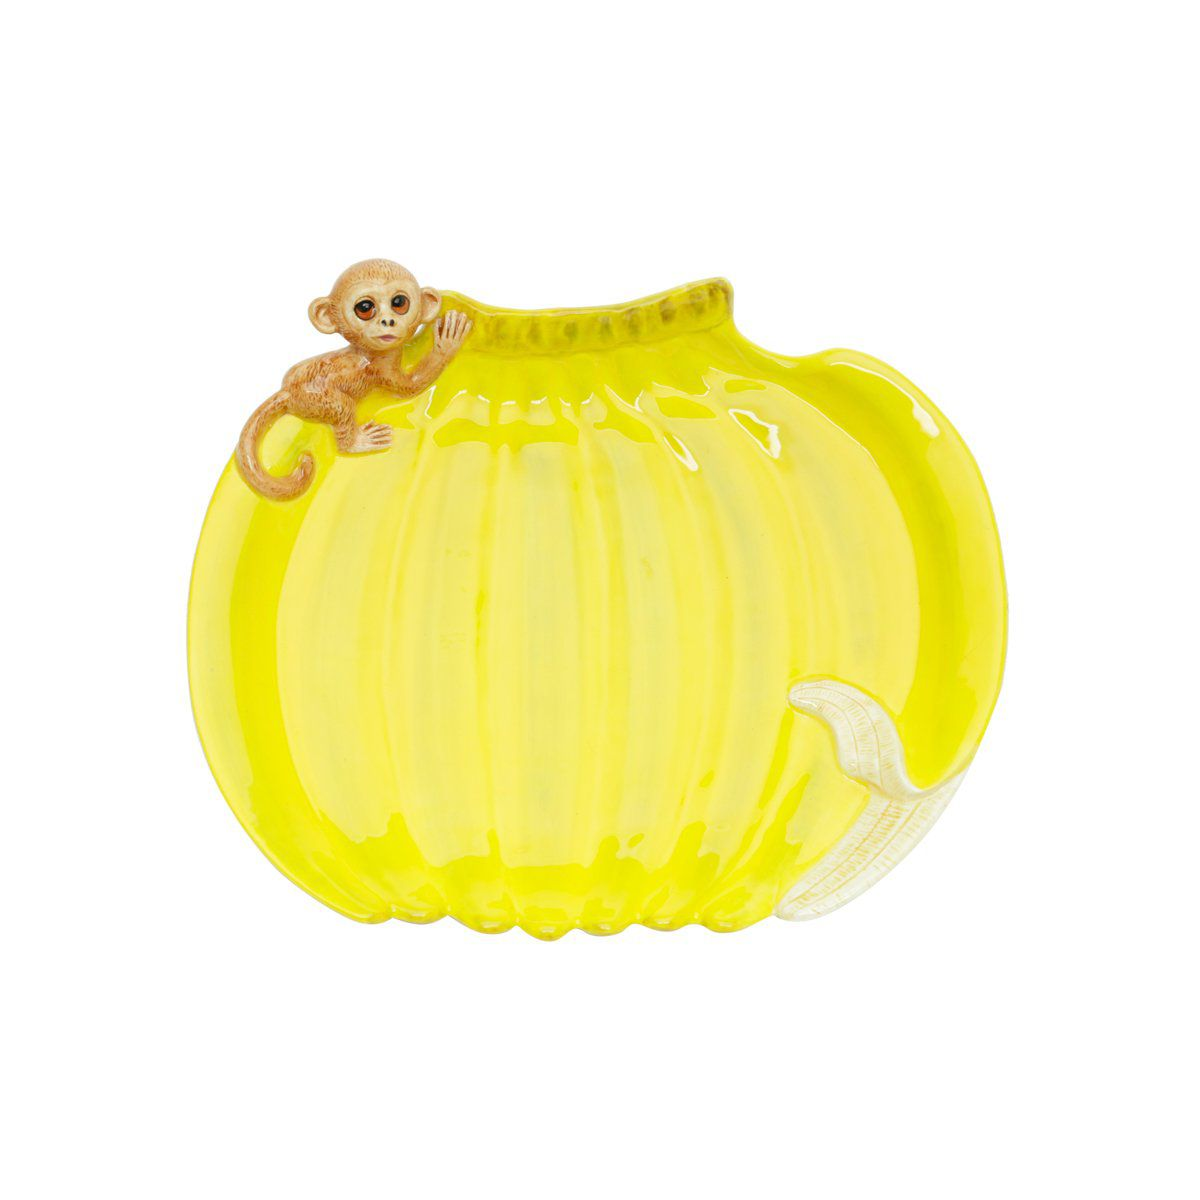 Prato 23,5 x 20 cm de cerâmica amarela Banana Rojemac - 26799